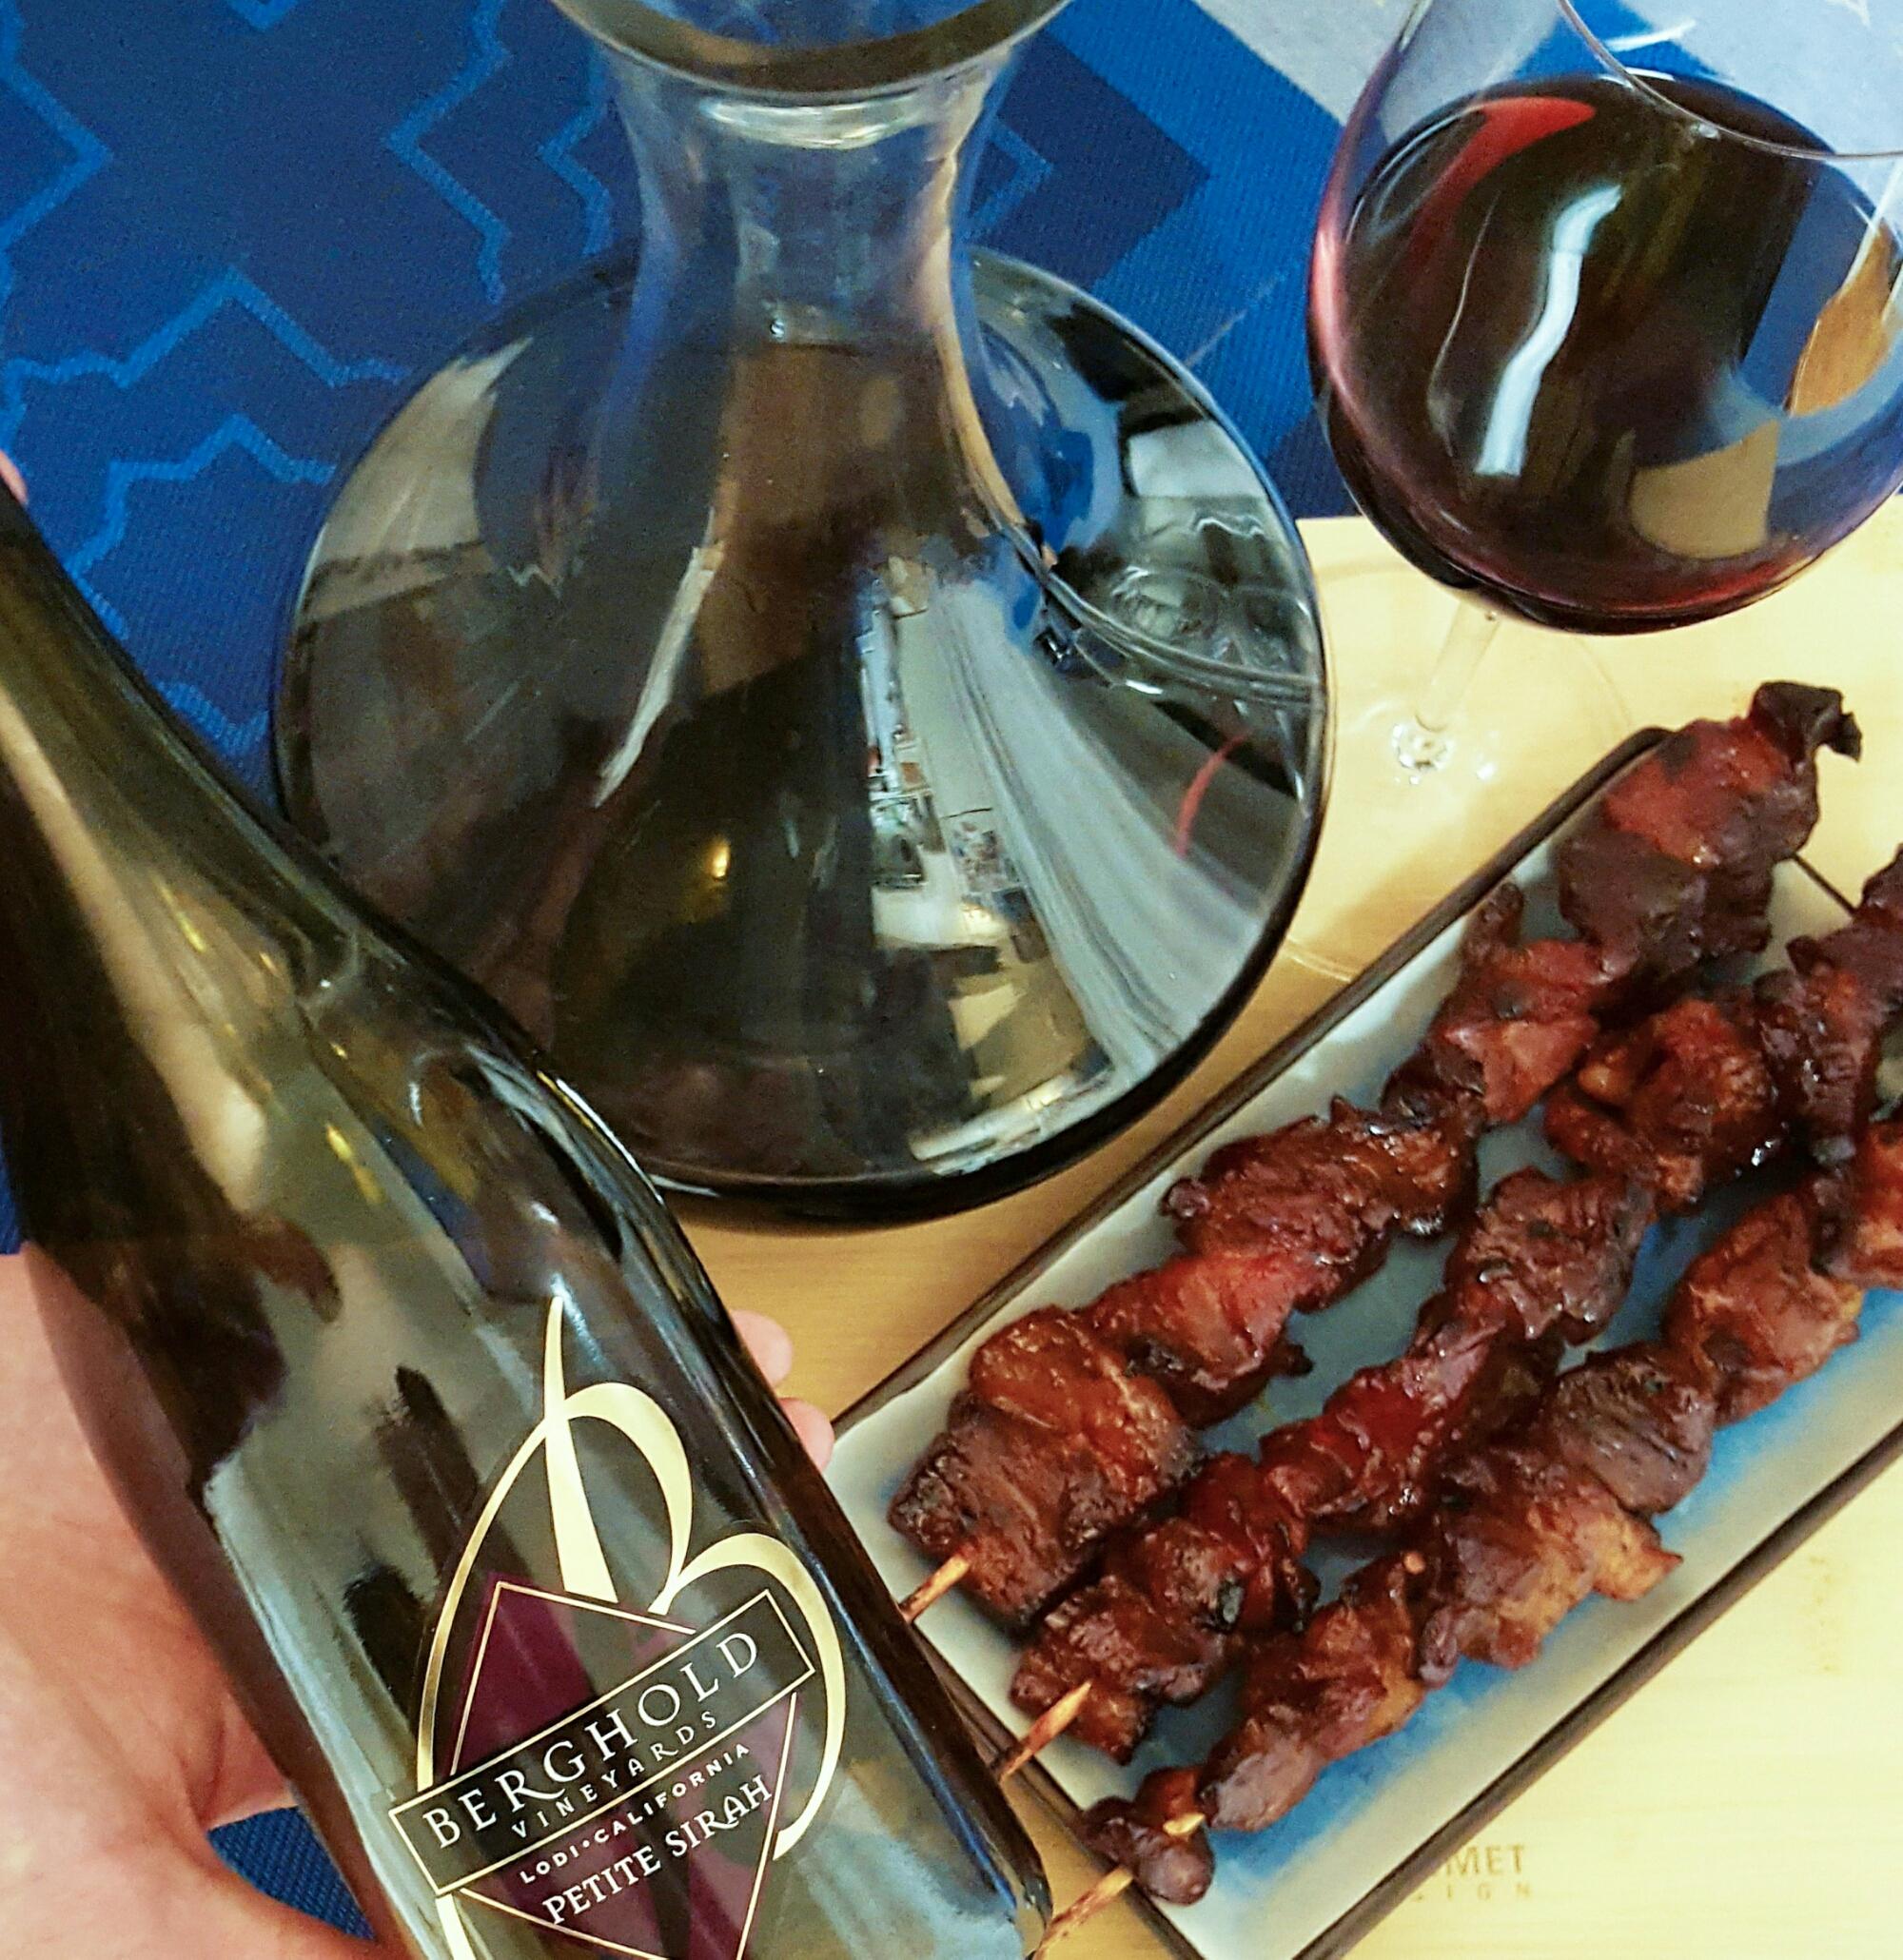 Filipino food wine pairing - Barbeque and Petite Sirah